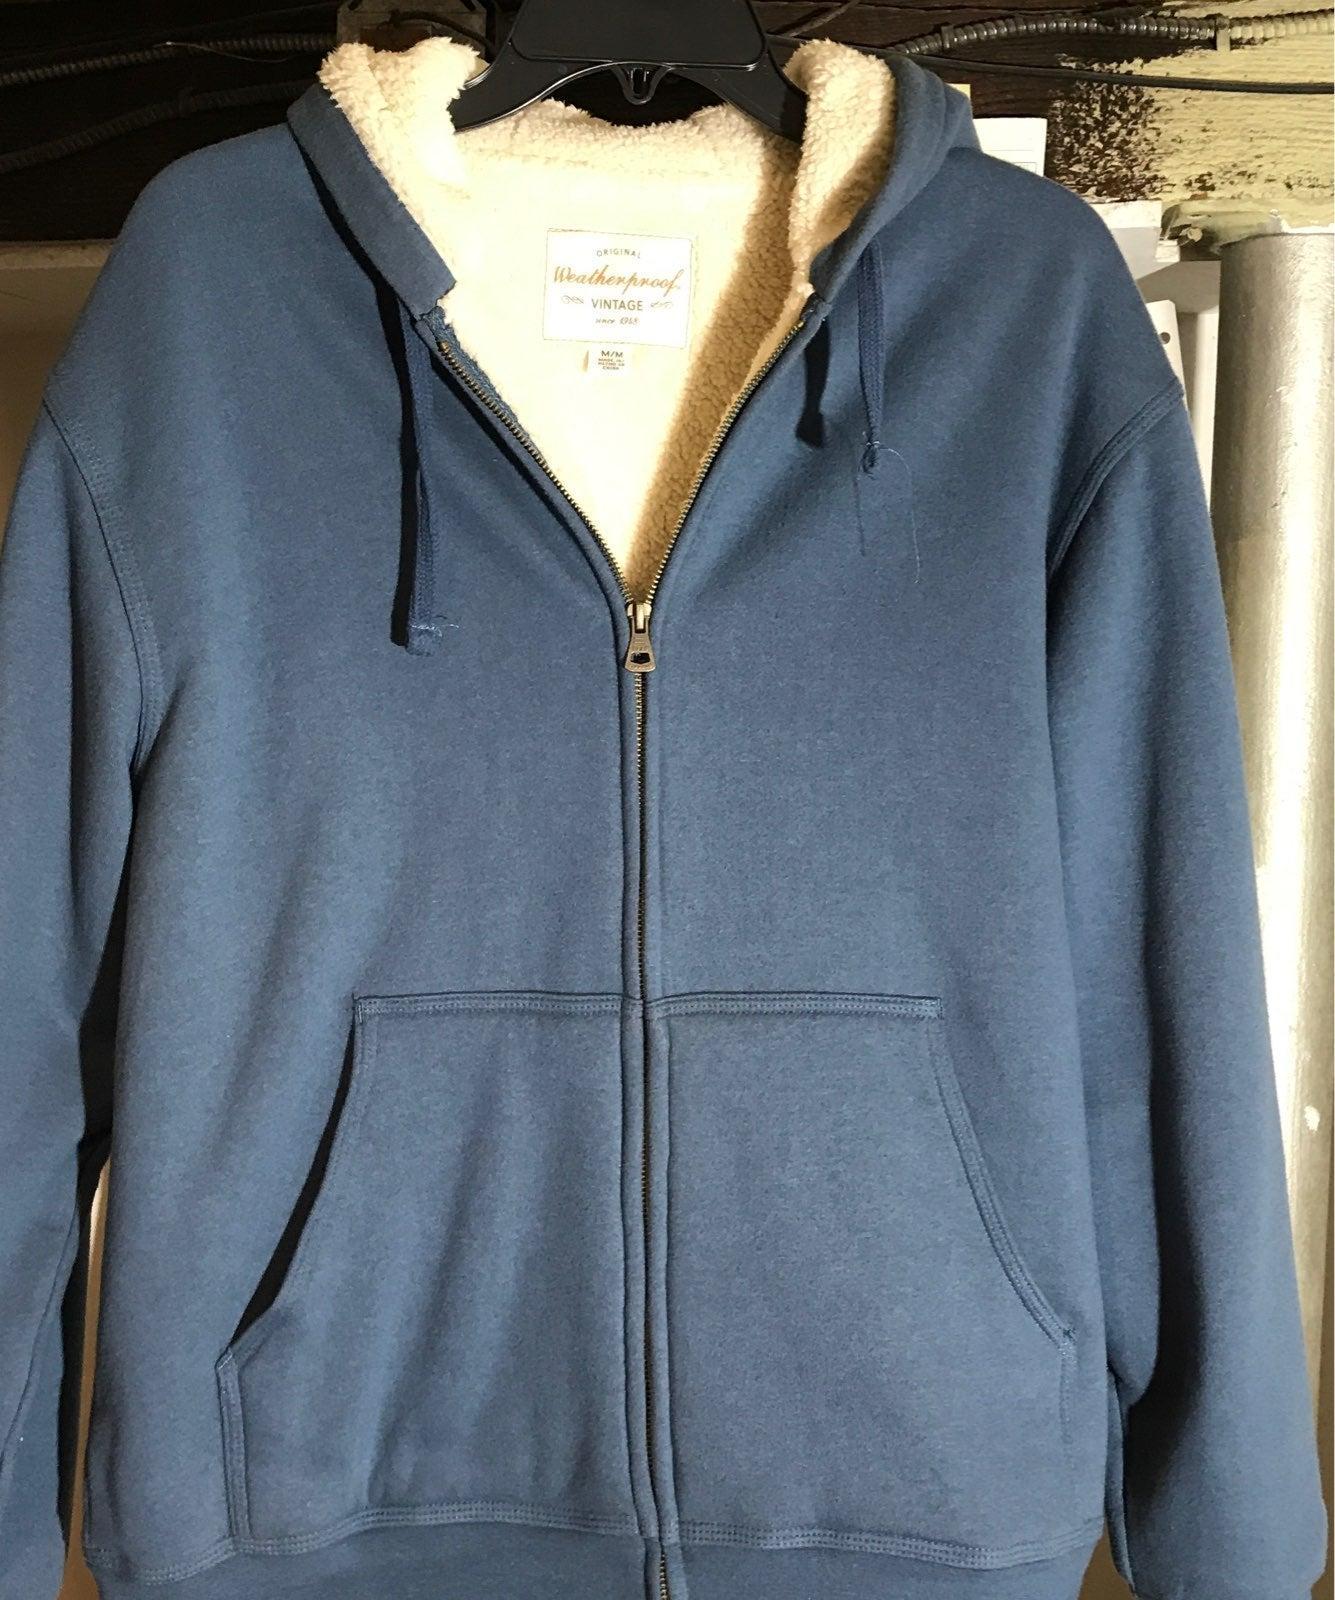 Men's hooded lined sweatshirt